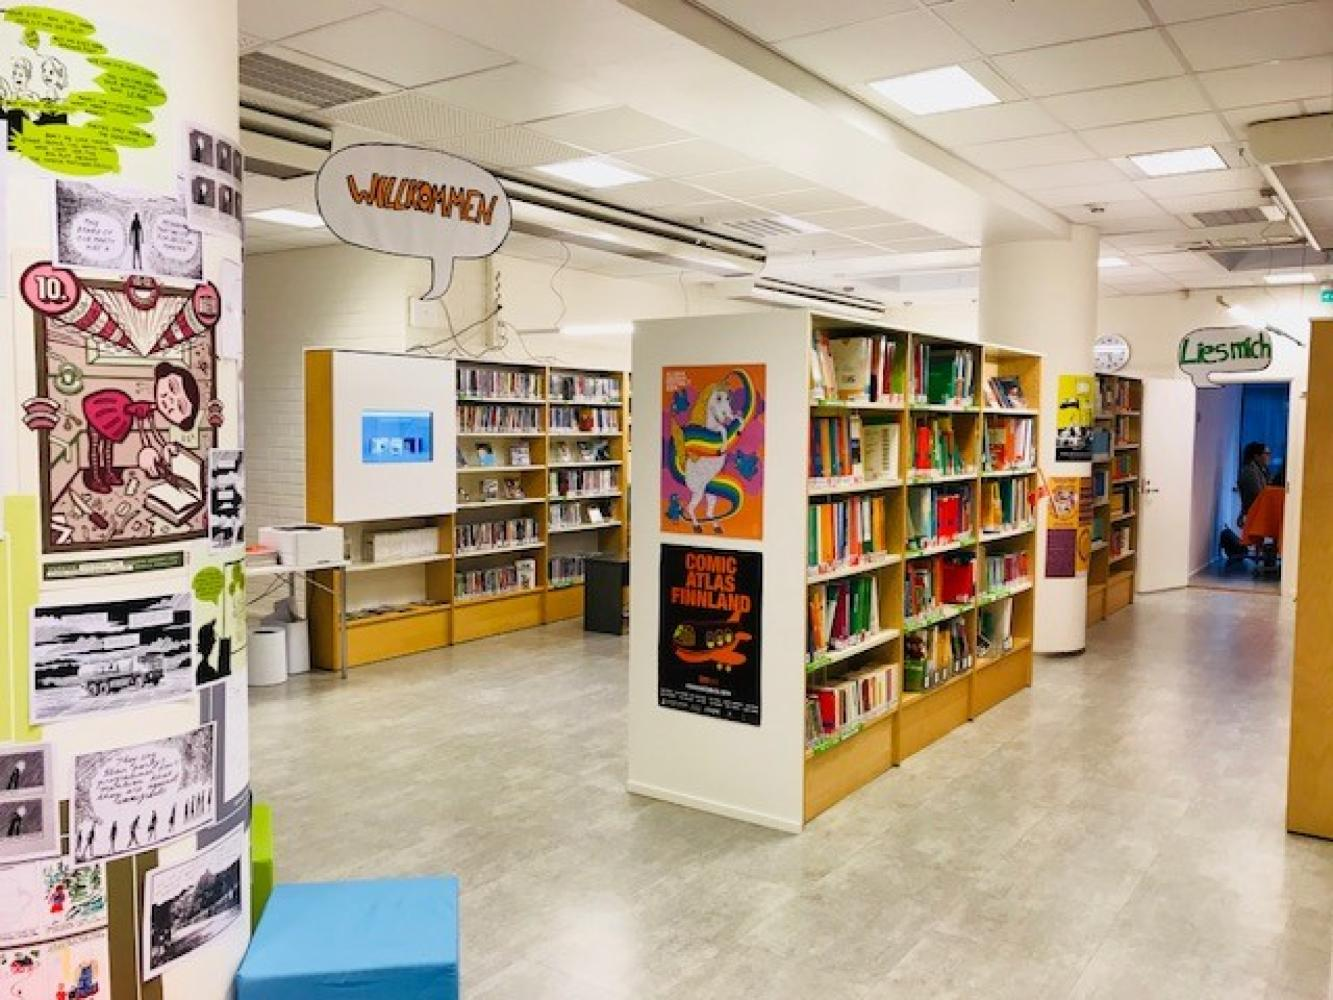 Goethe-Institutin kirjasto